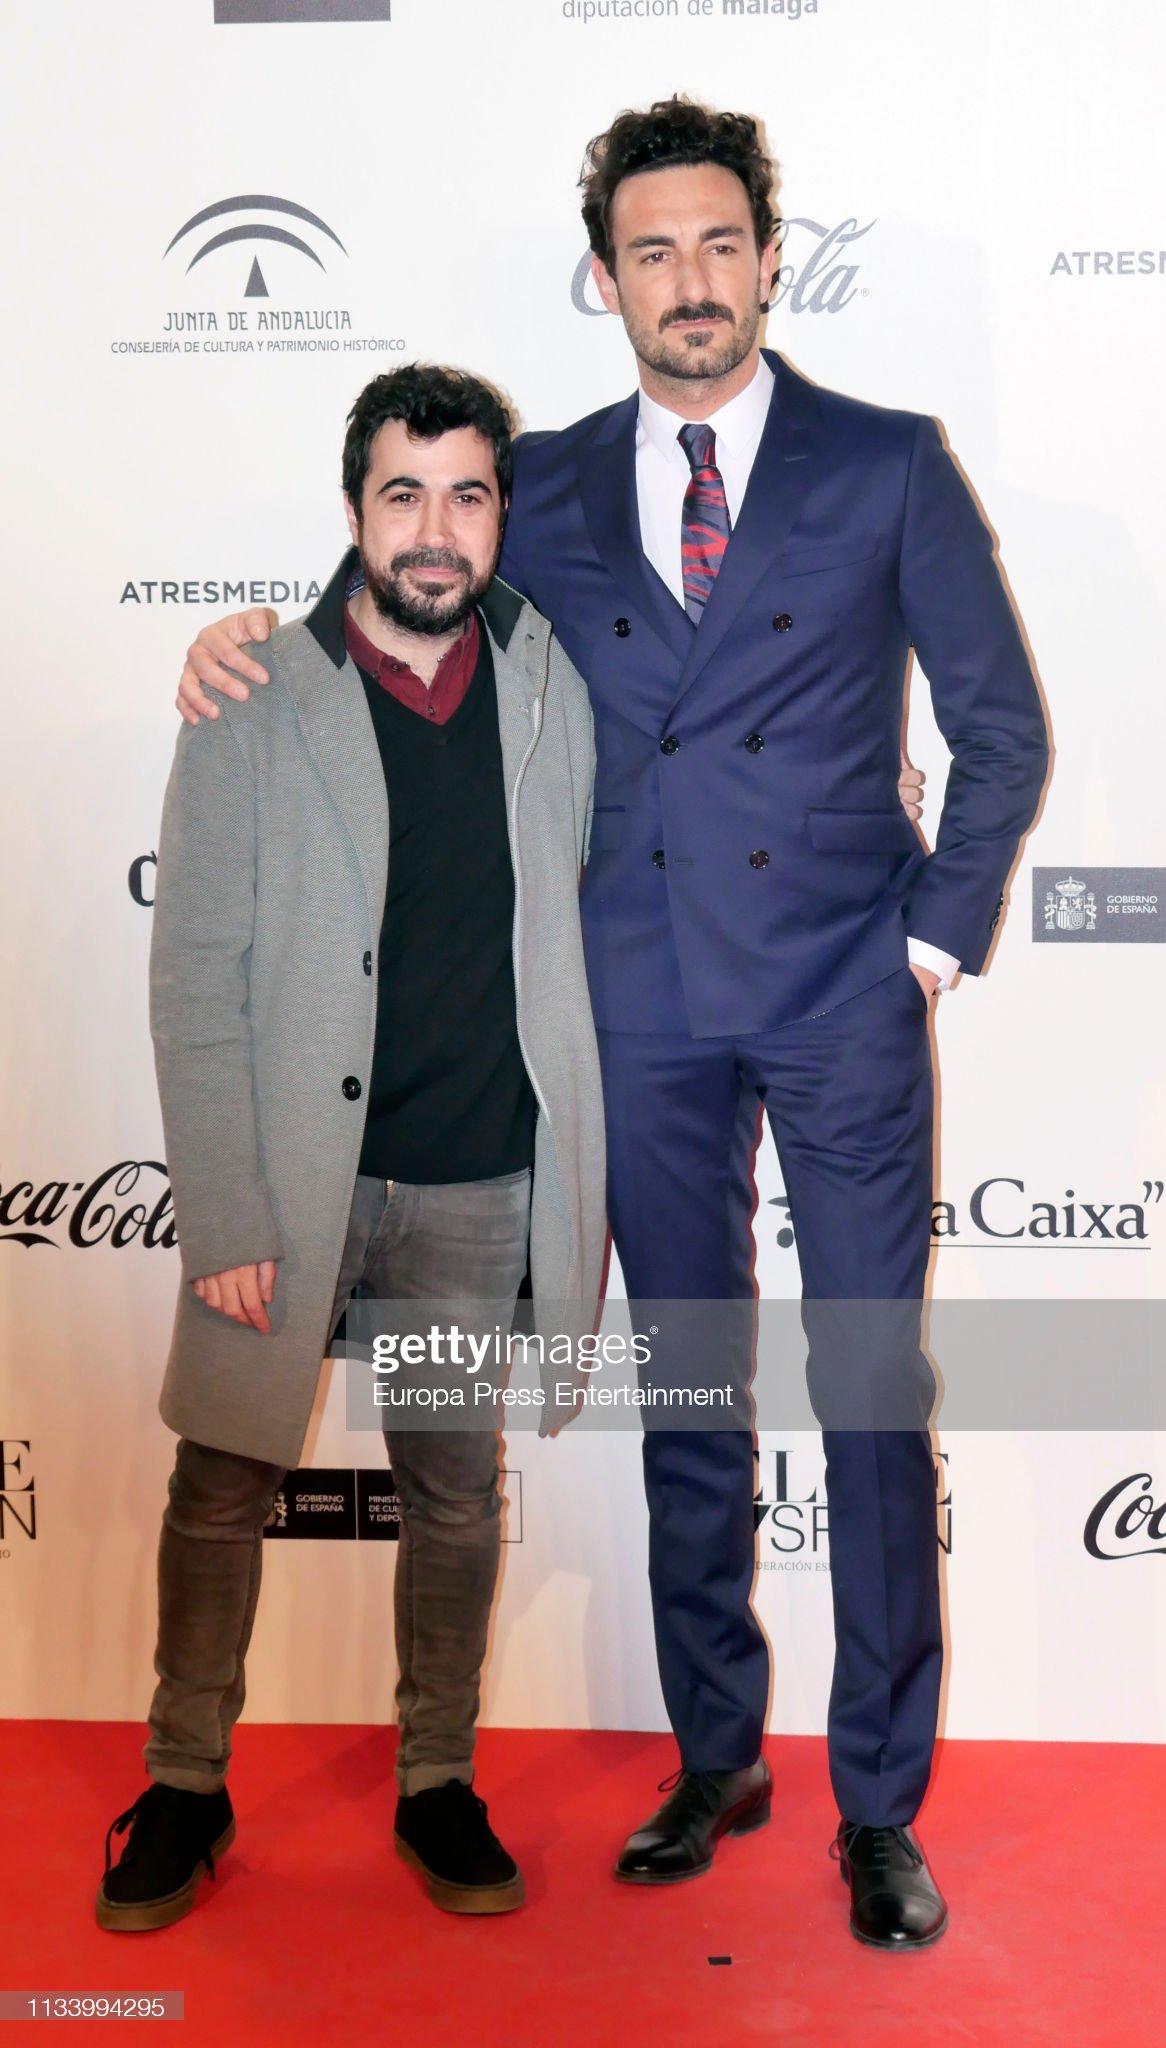 ¿Cuánto mide Miki Esparbé? - Altura Miki-esparbe-attends-malaga-film-festival-2019-cocktail-at-circulo-de-picture-id1133994295?s=2048x2048